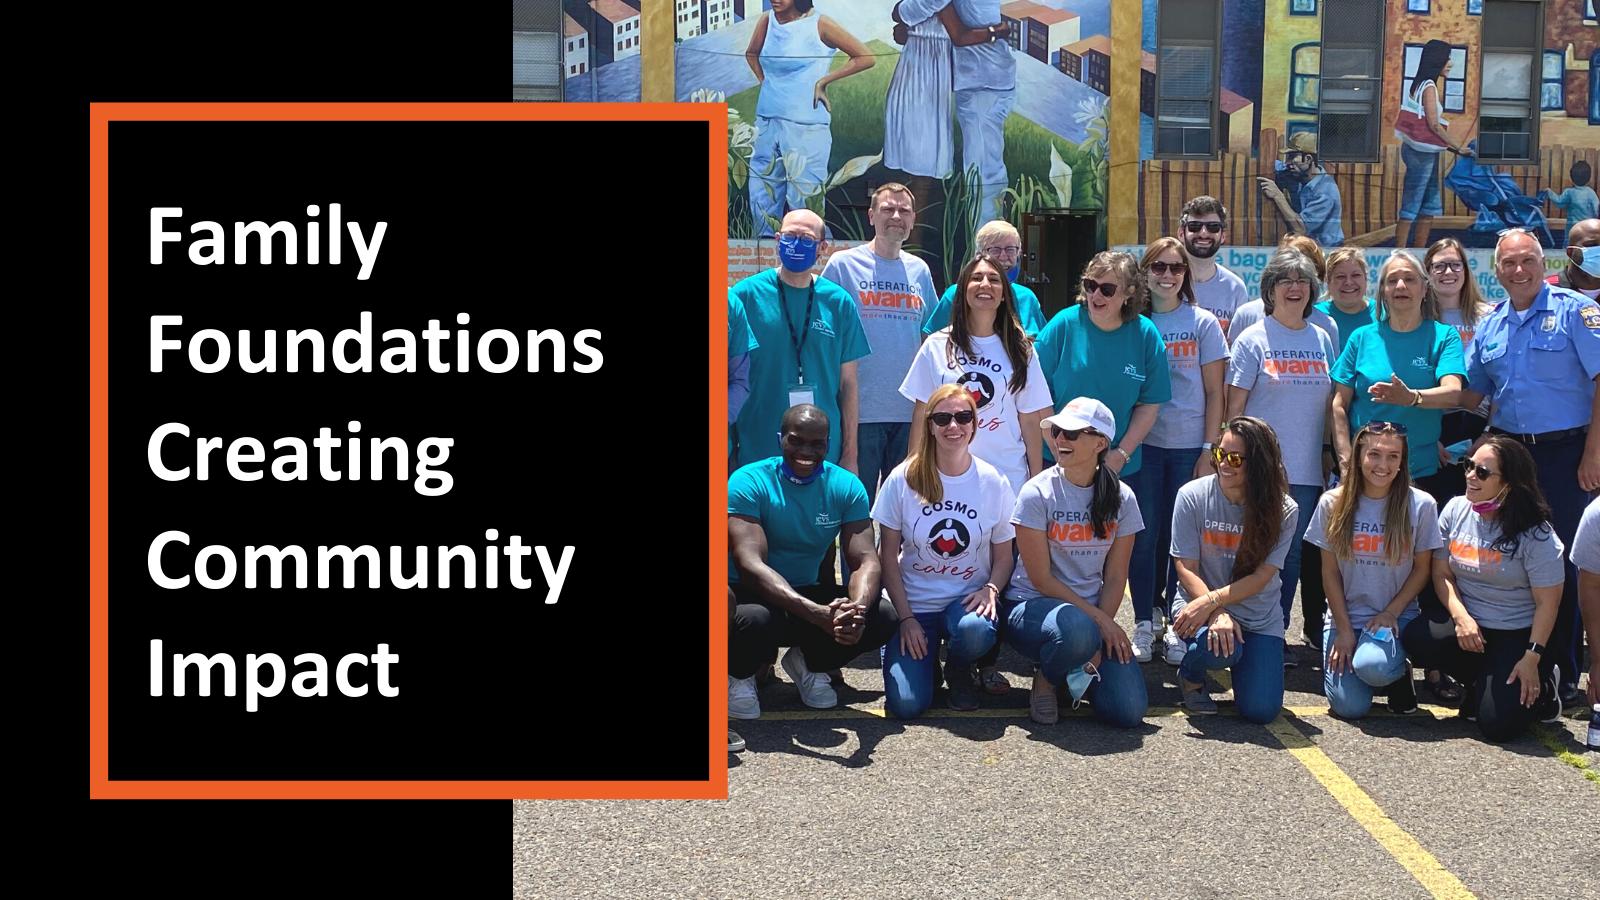 Family Foundations Creating Community Impact